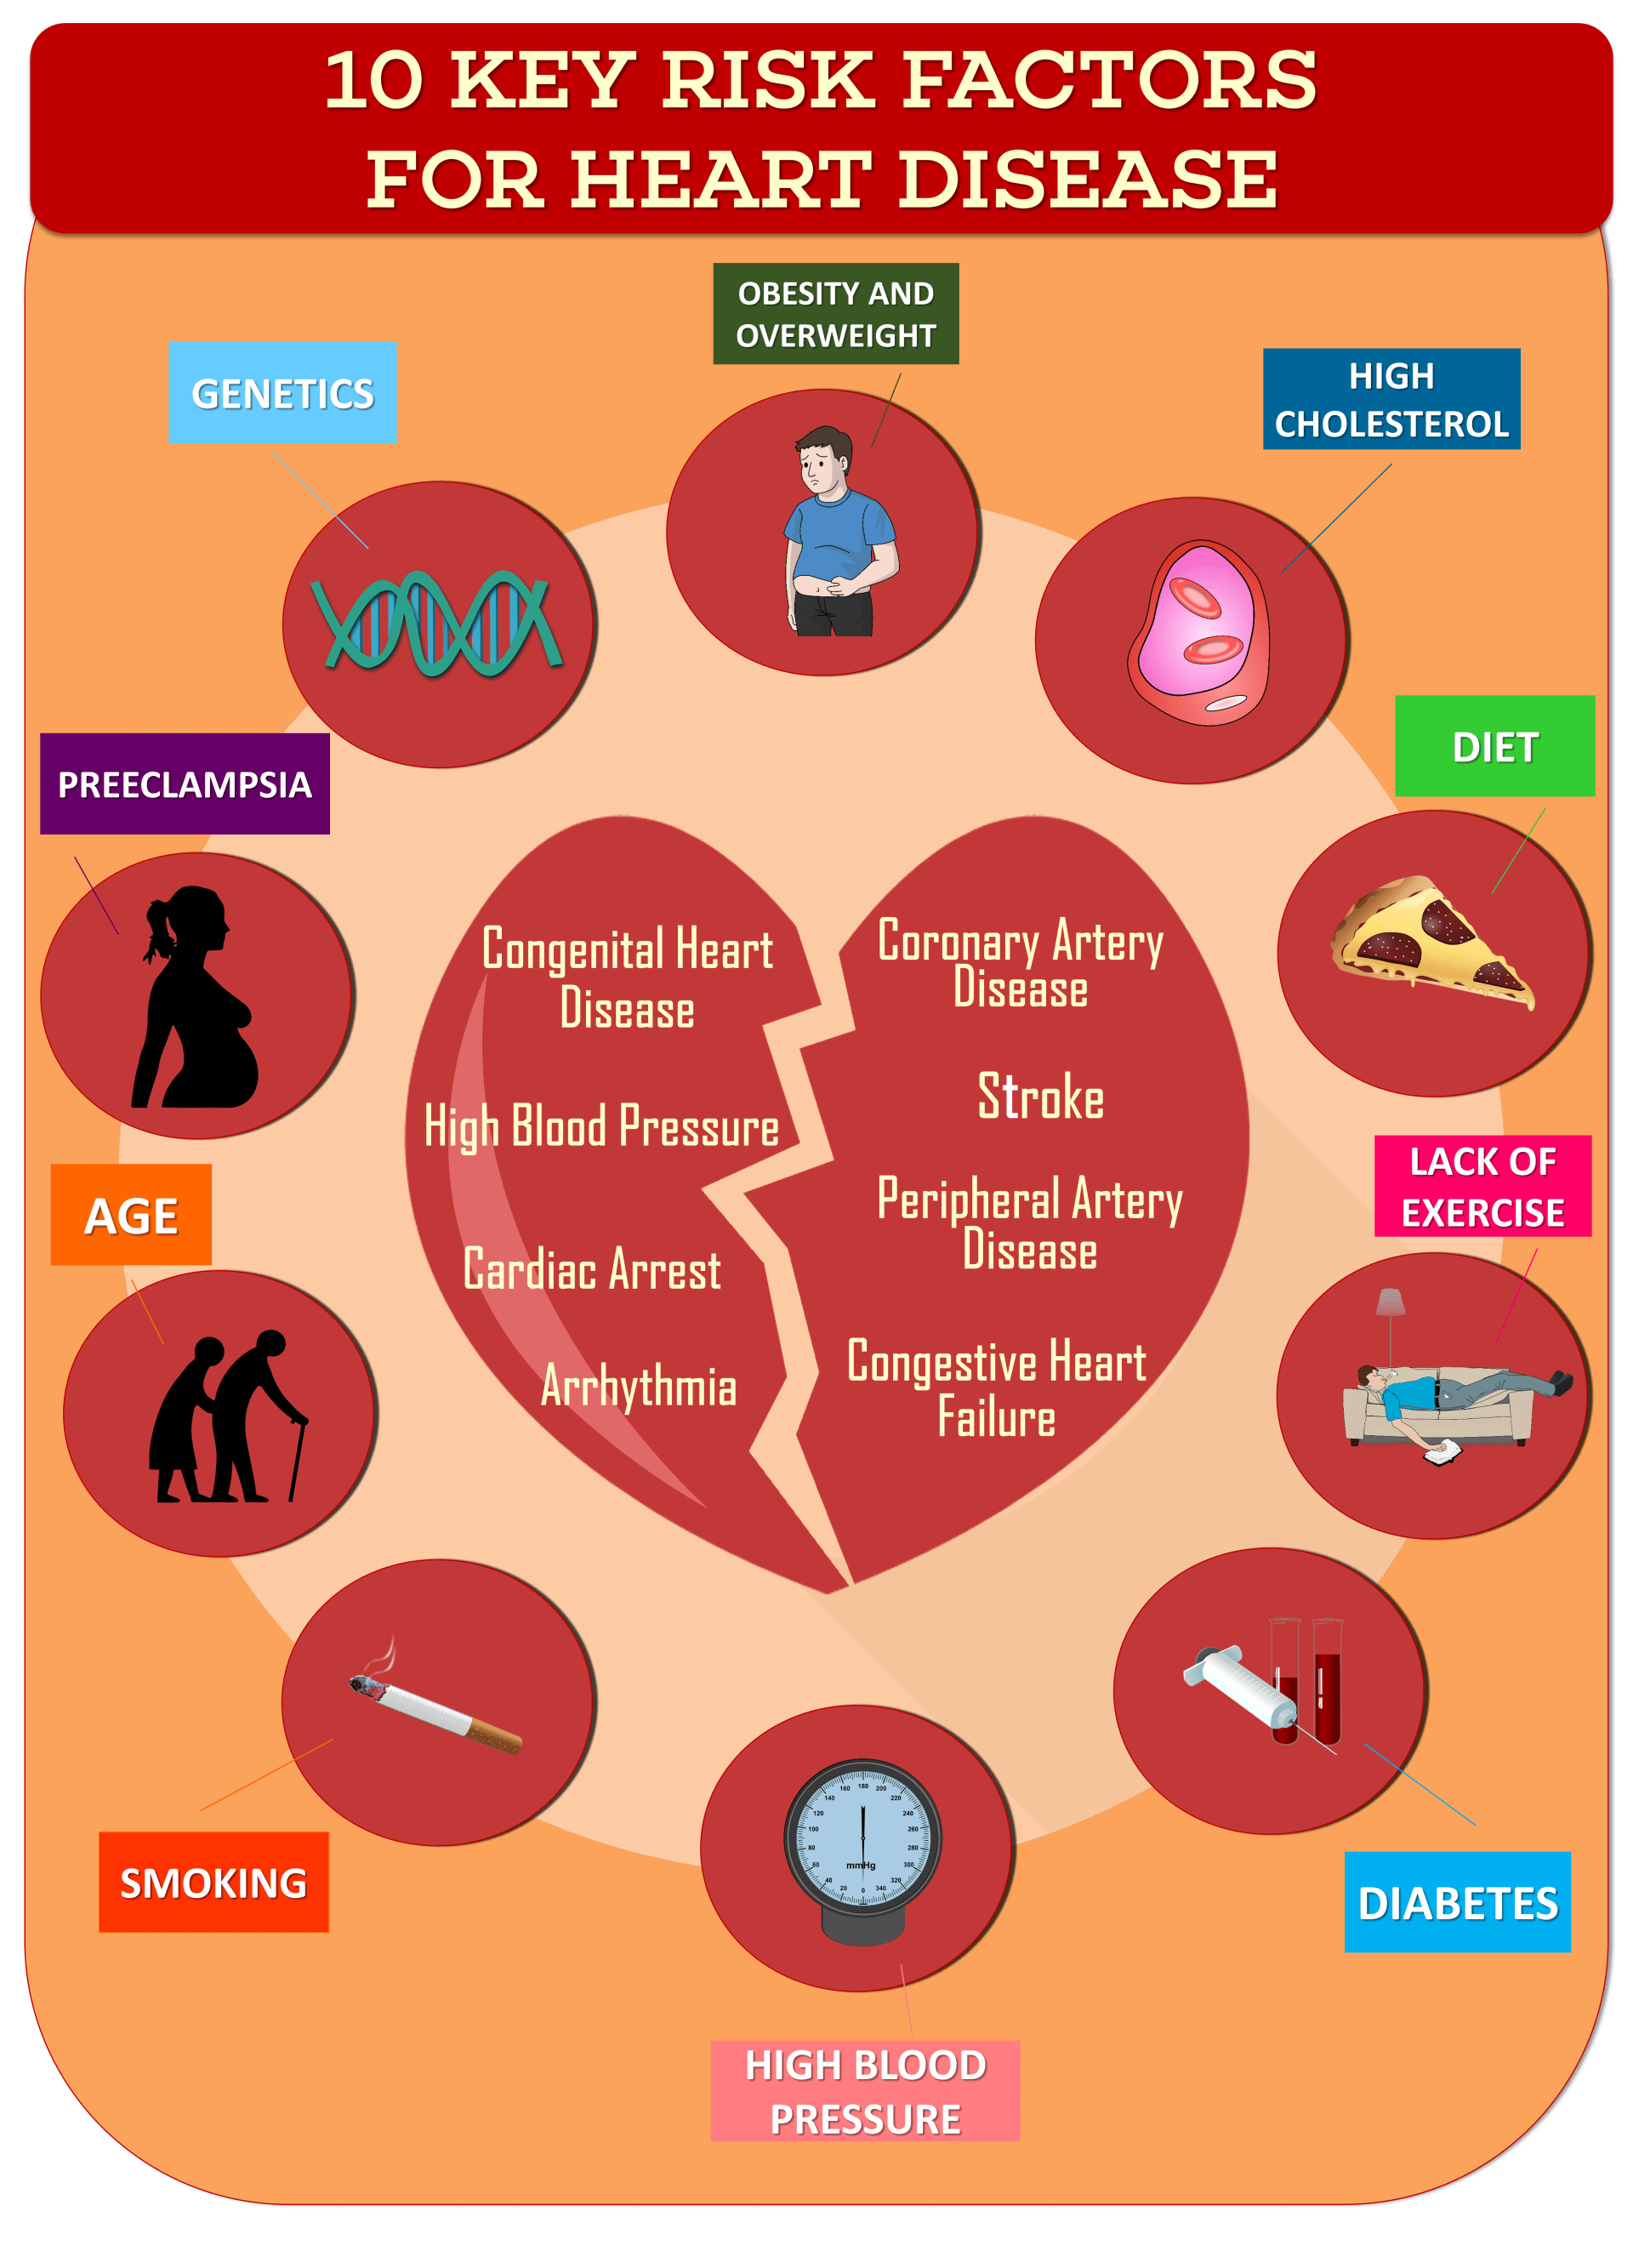 Key Risk Factors For Heart Disease Infographic Heart